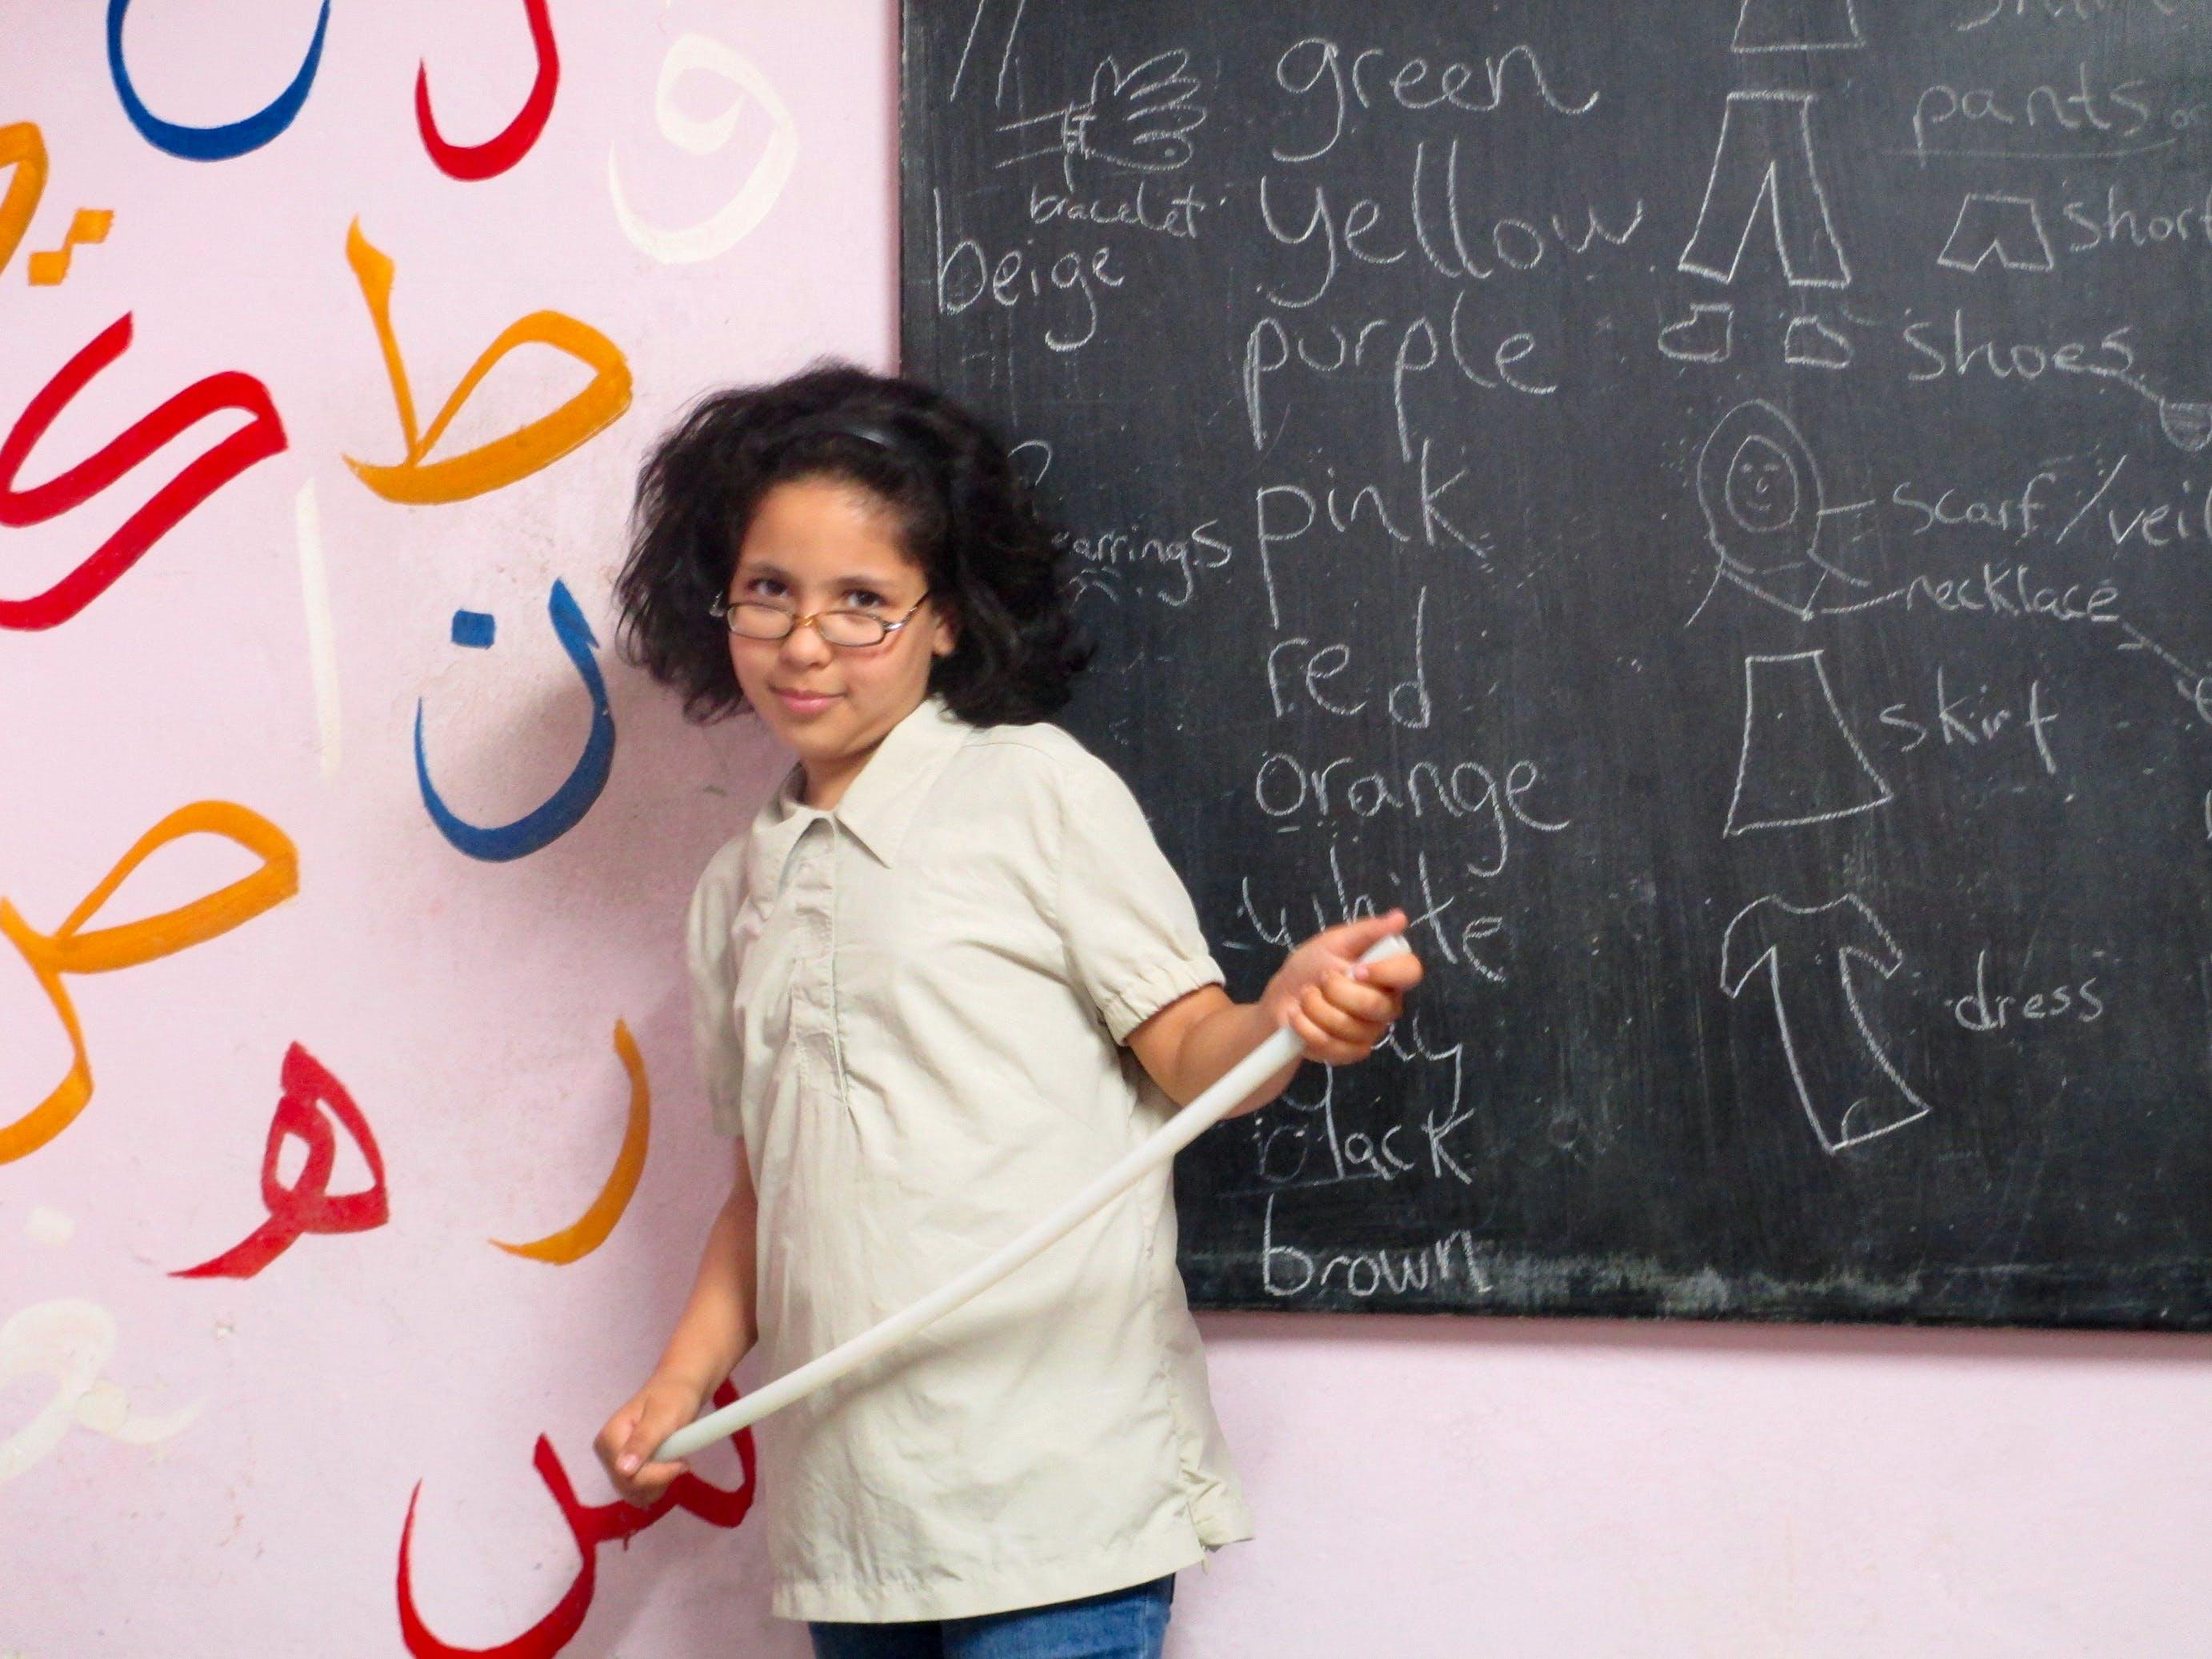 Teaching English, French or Spanish